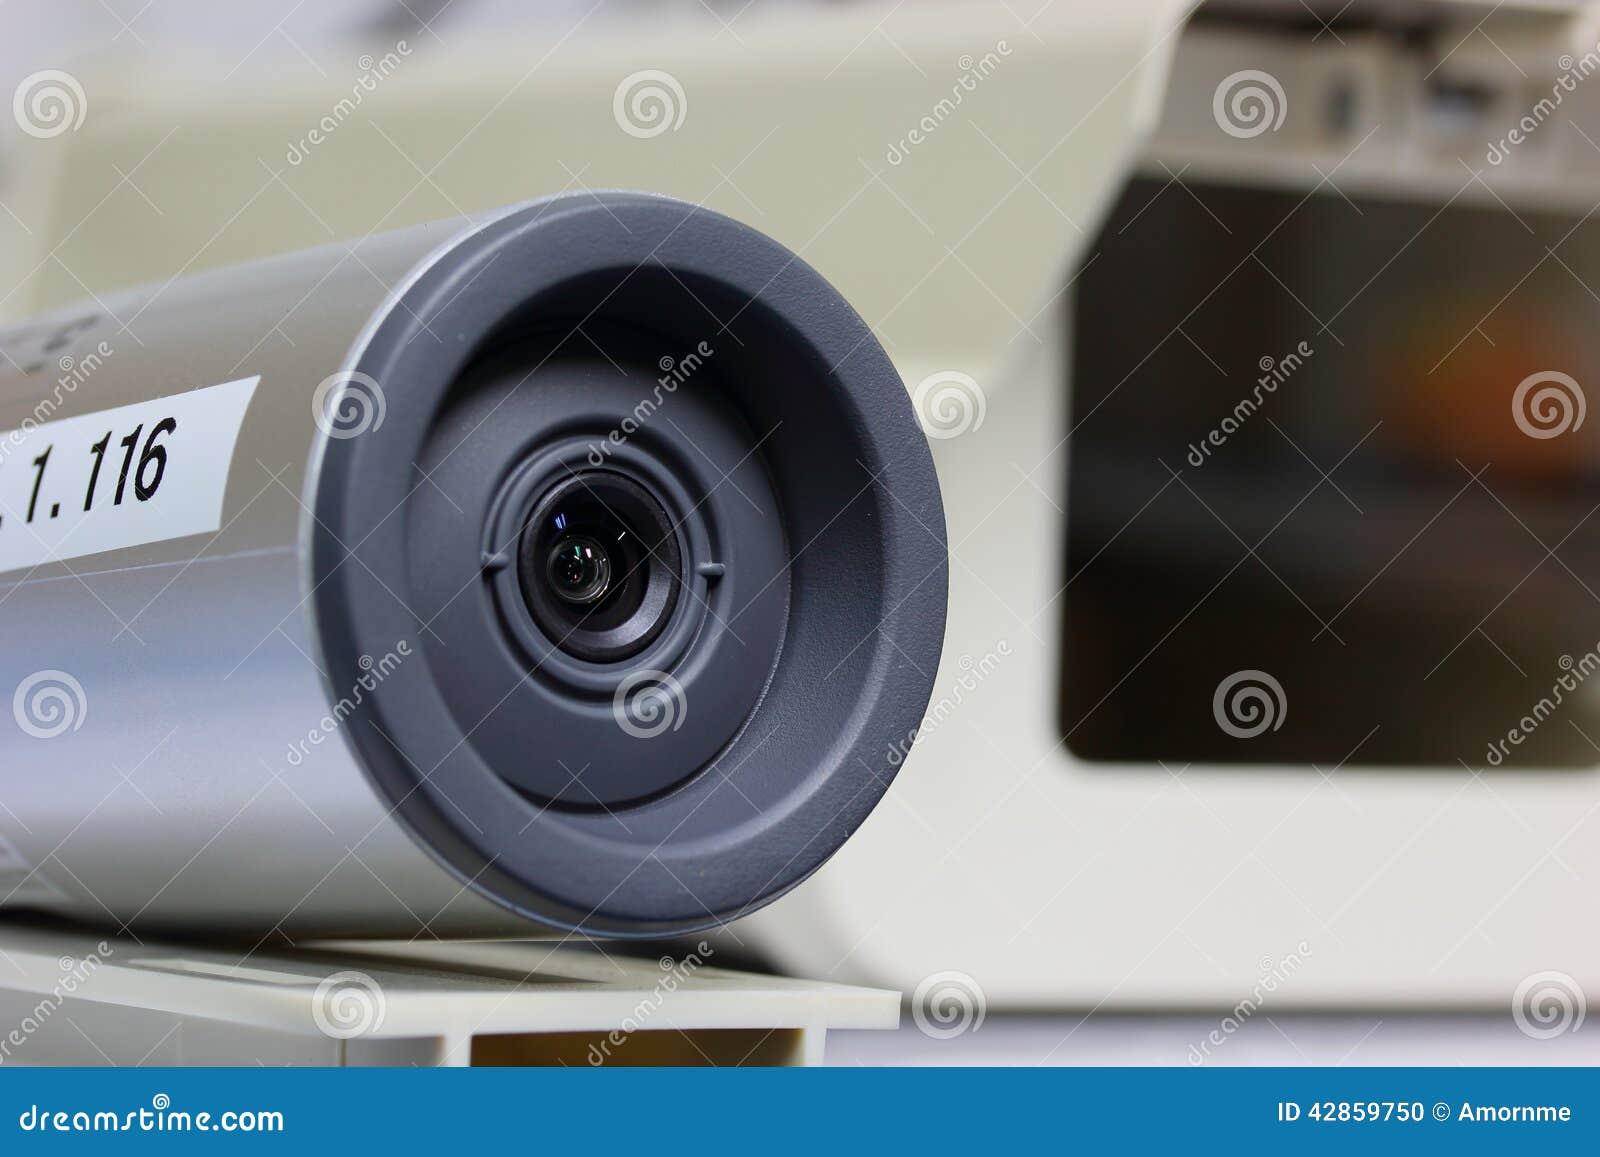 Camera Closeup 61